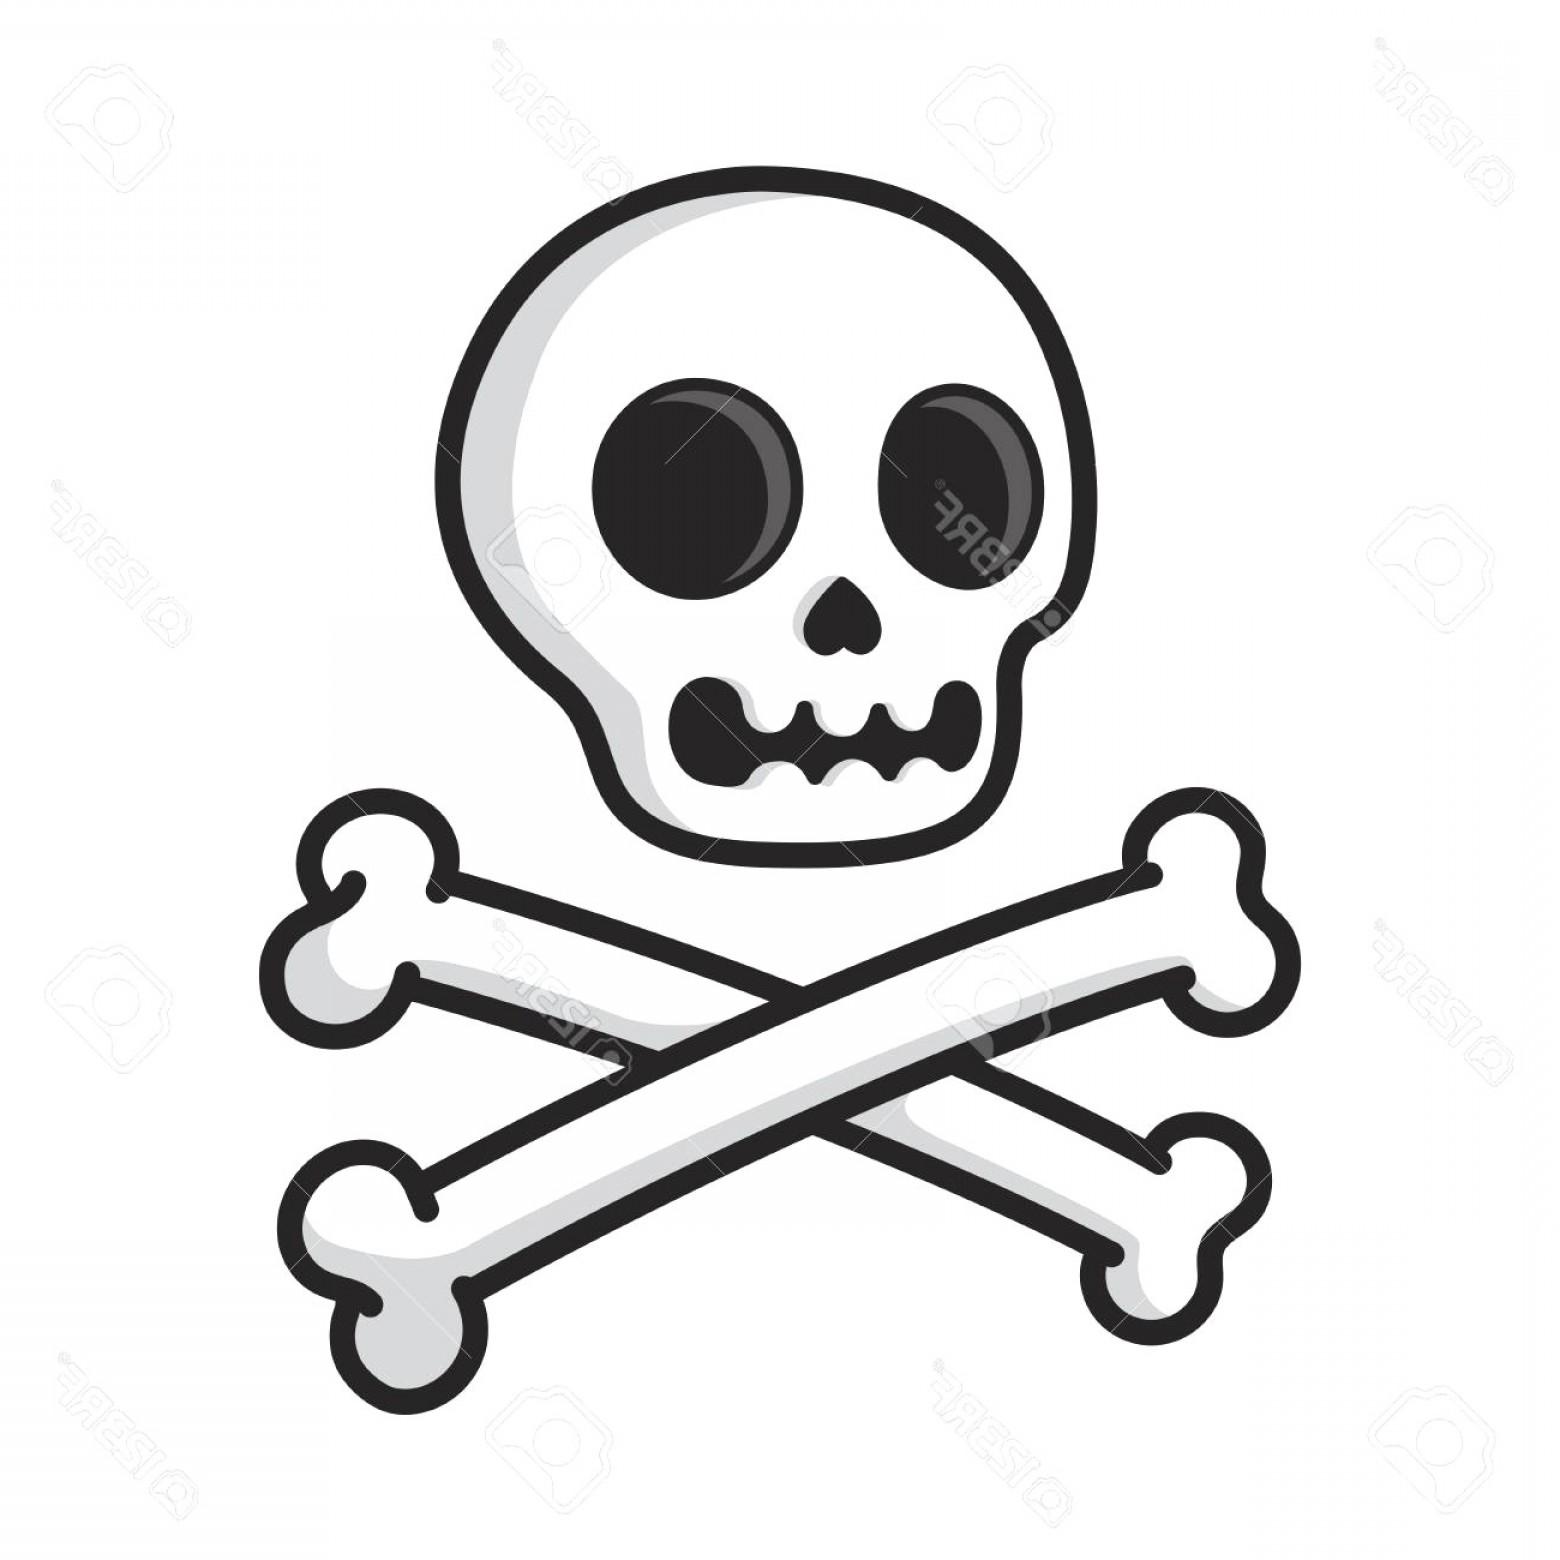 1560x1560 Simple Cartoon Skull And Crossbones Isolated On White Modern Comic